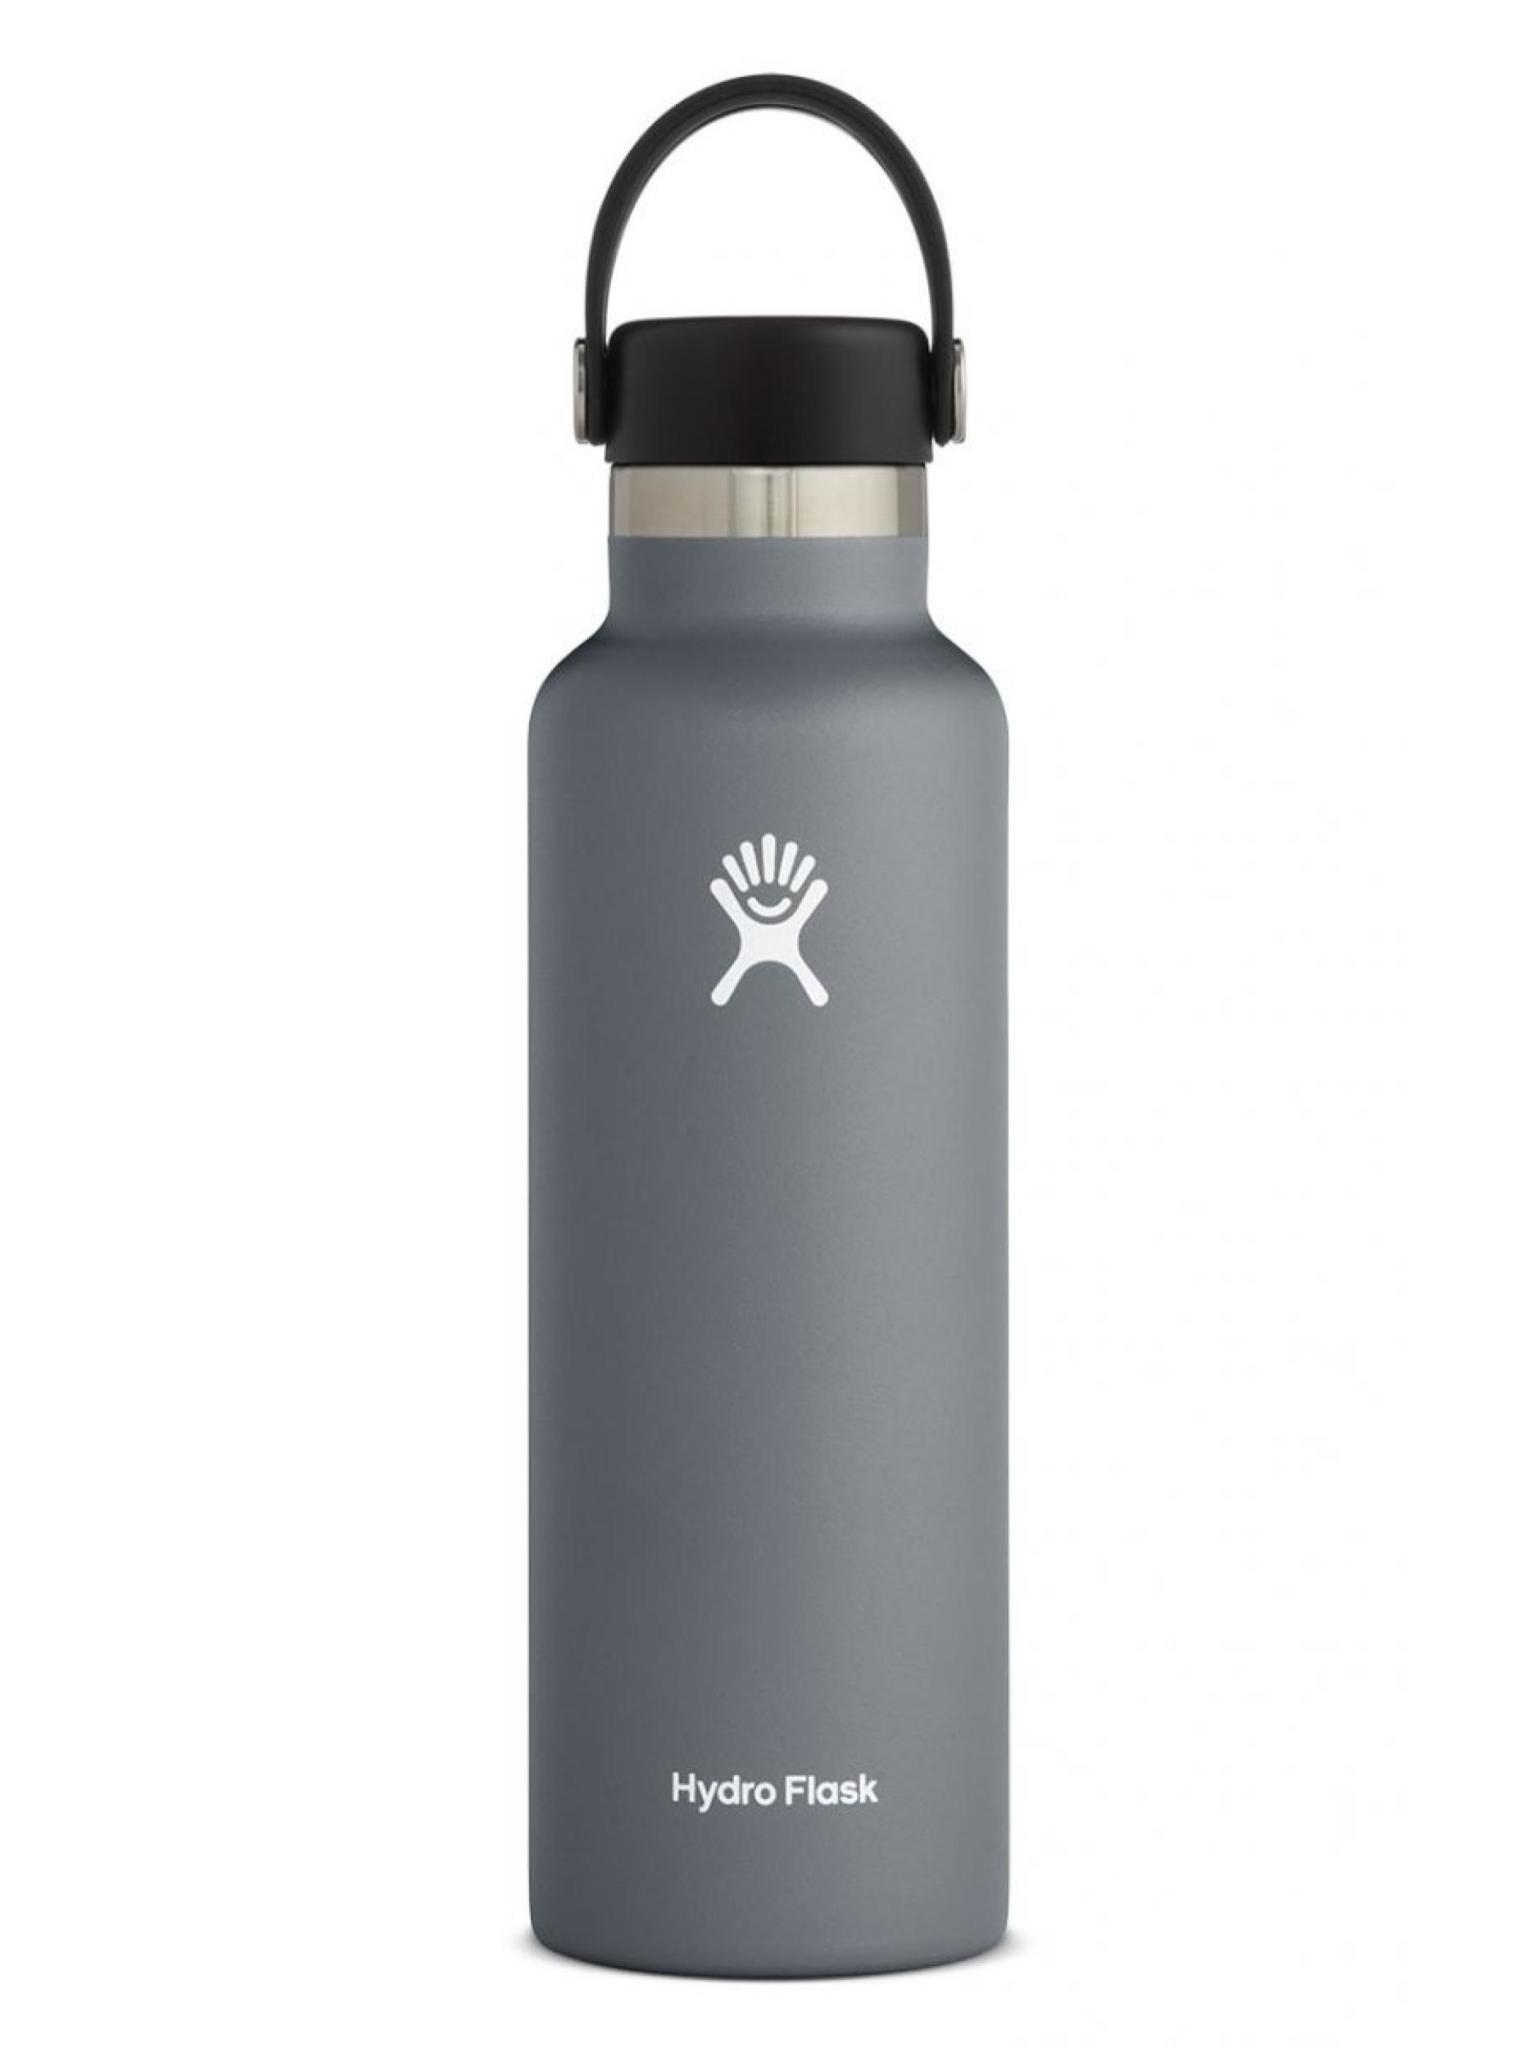 Hydro Flask 21 Oz Waterbottle with Flex Cap